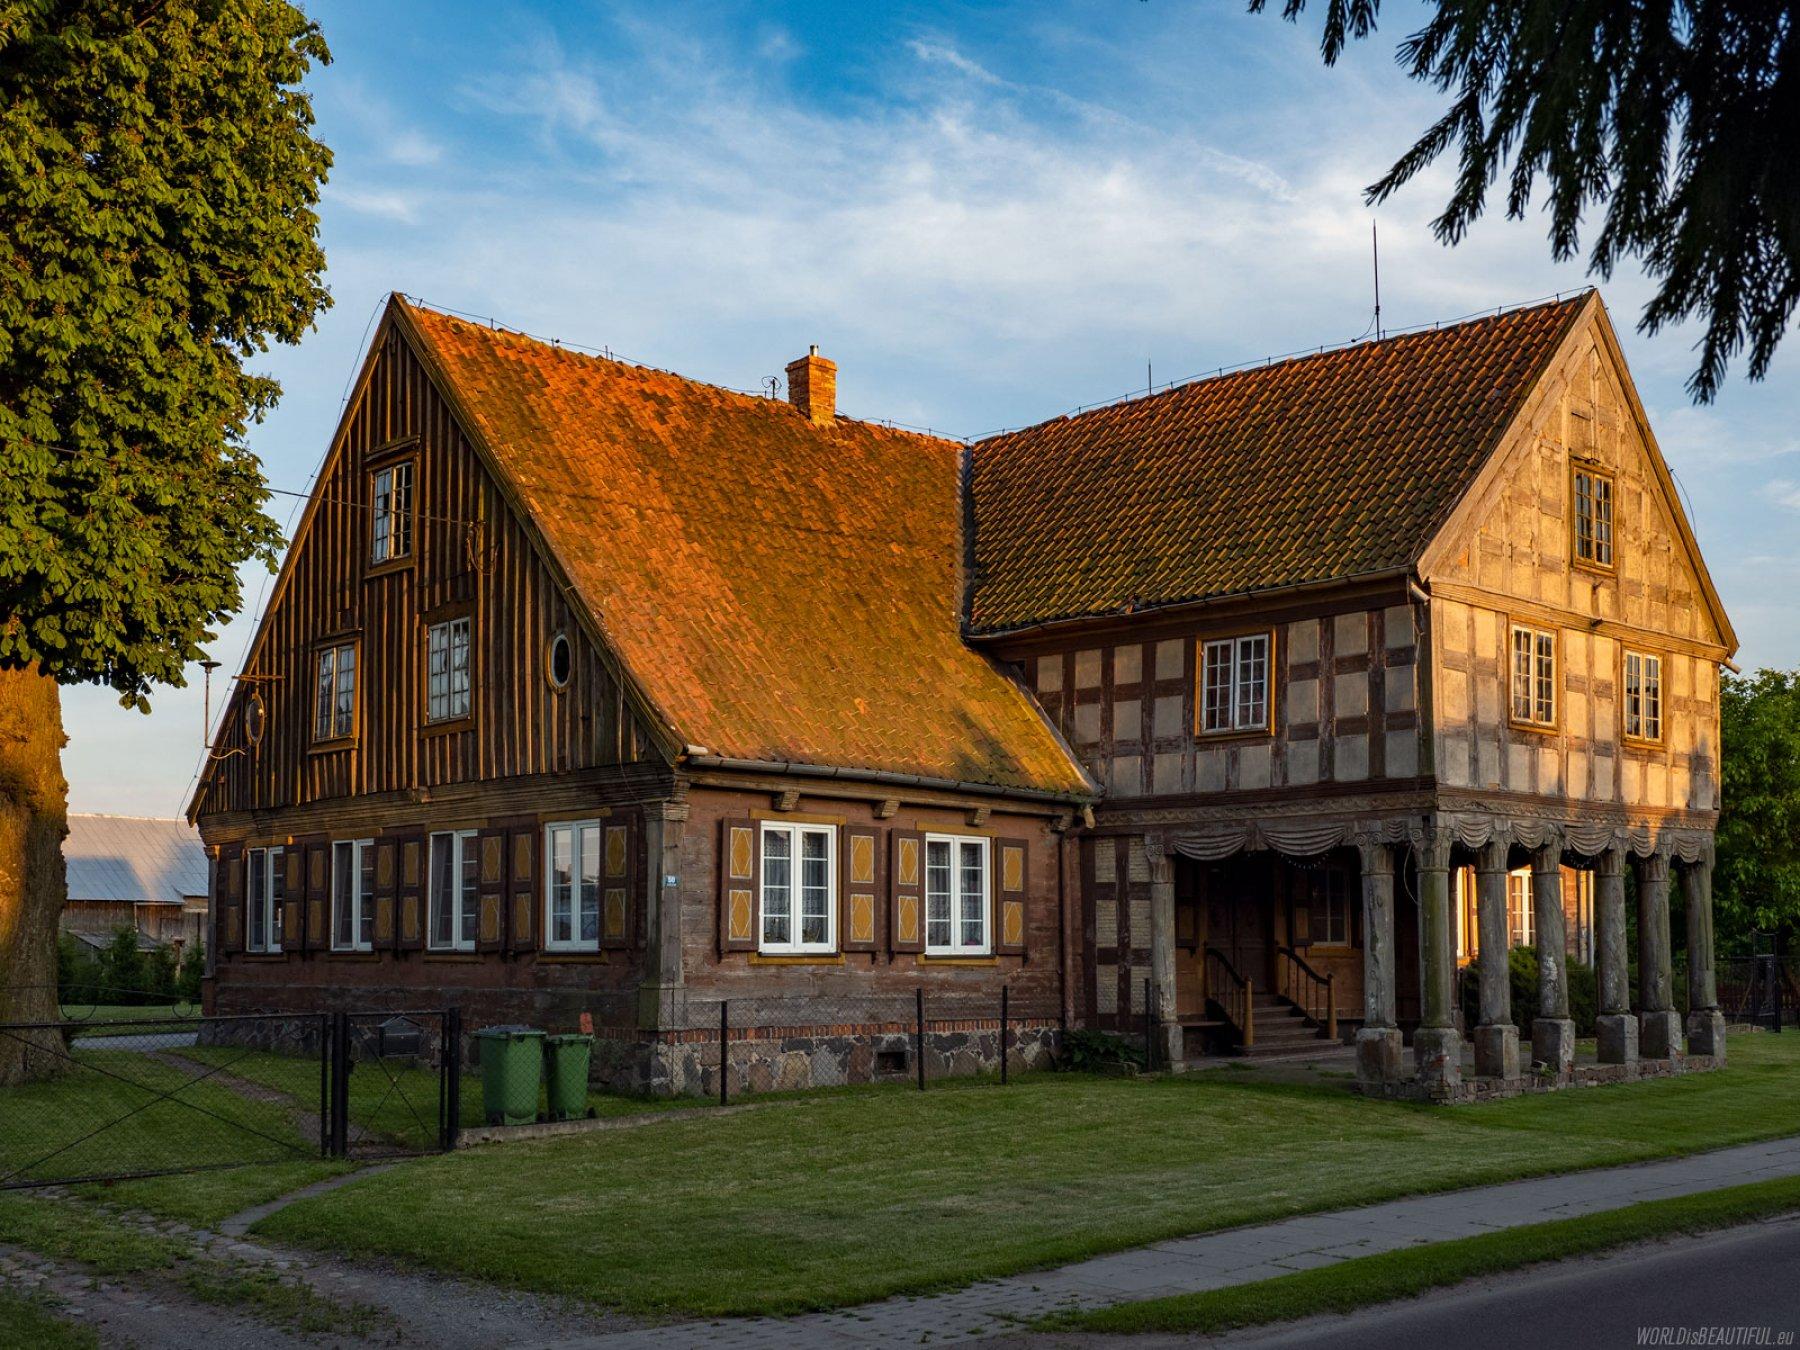 Rural architecture of Żuławy